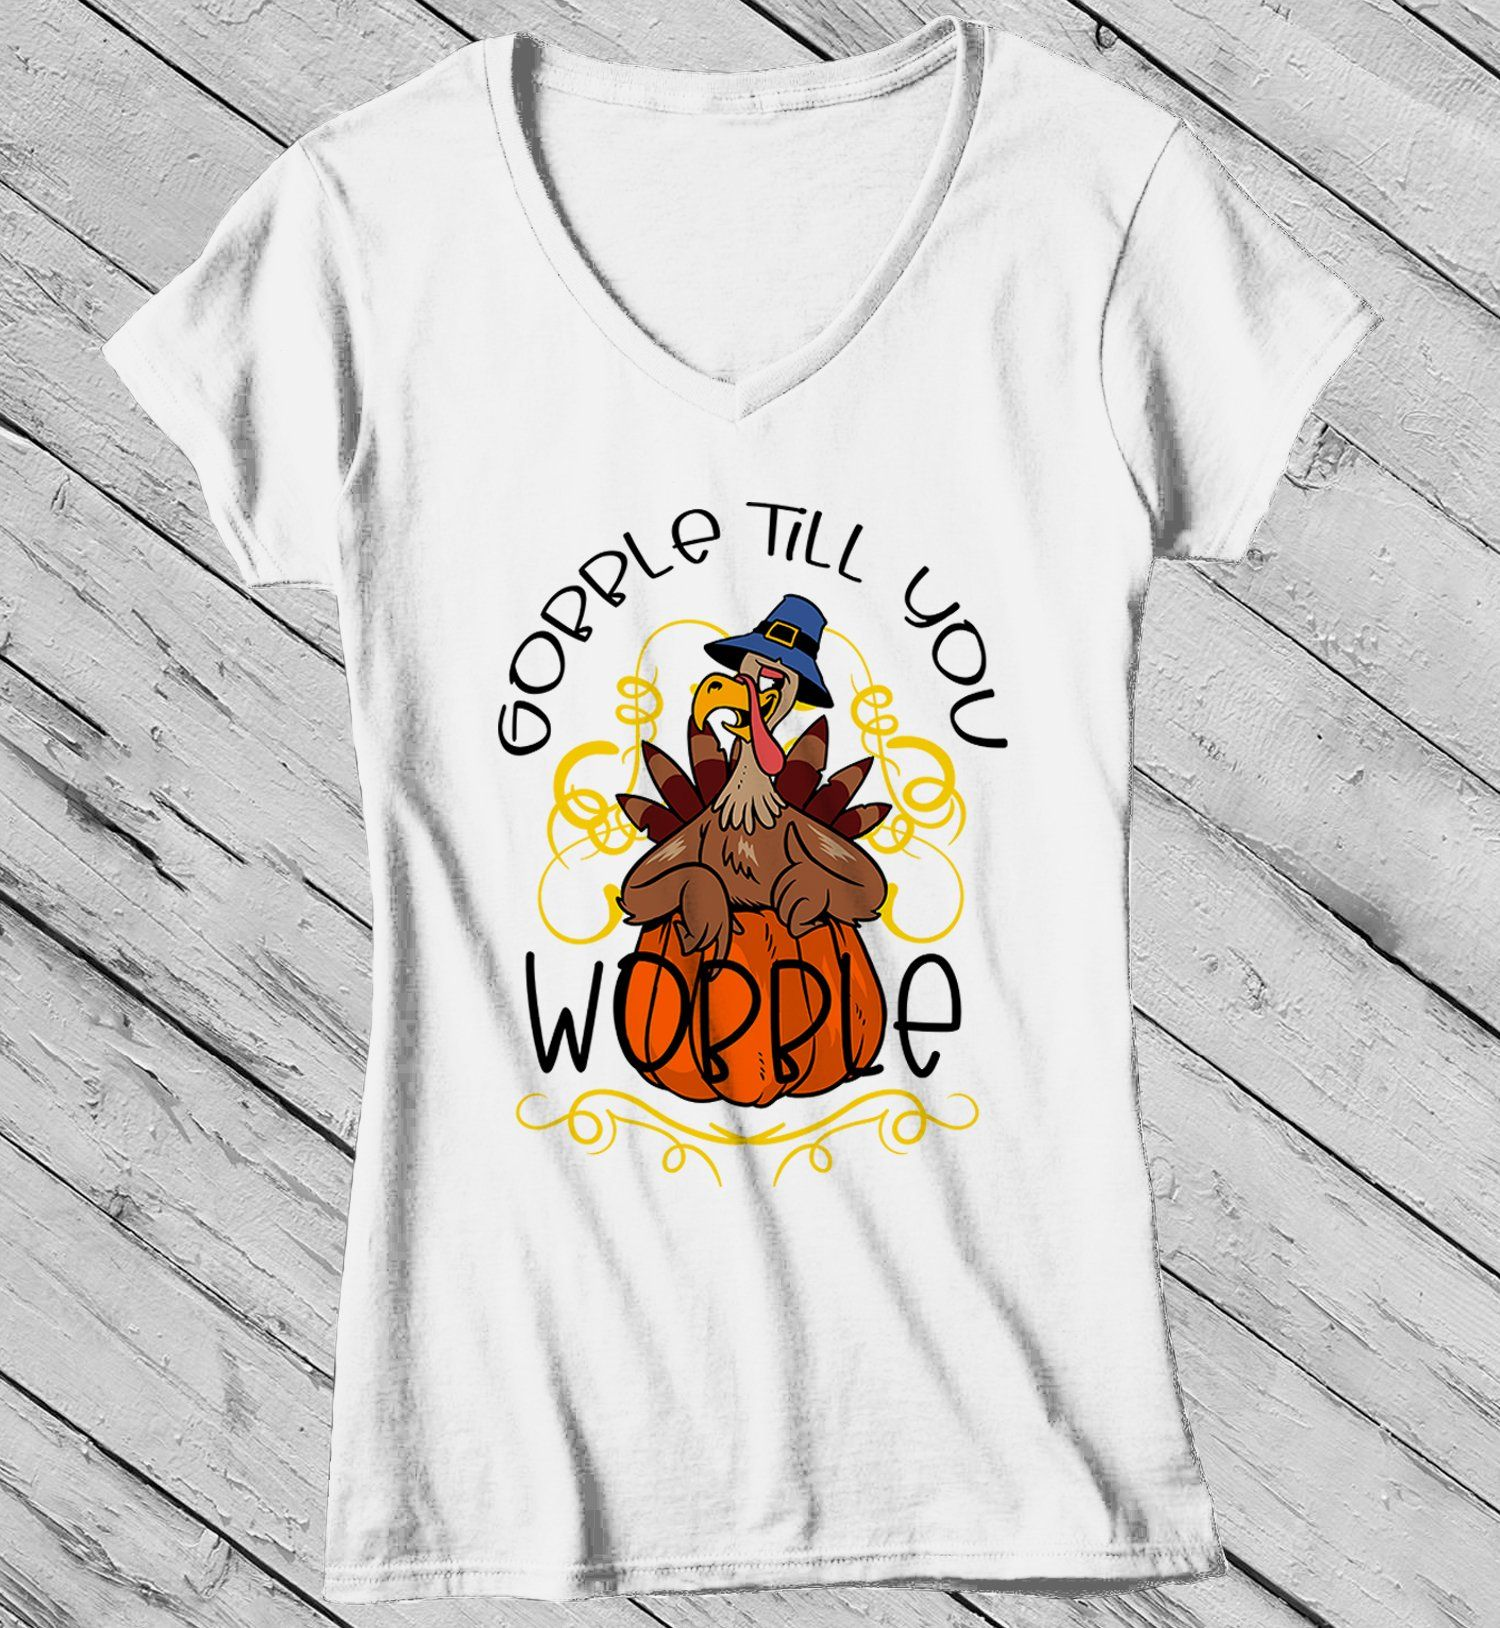 ff87f65f Women's Gobble T Shirt Wobble Shirts Gobble Till You Wobble Thanksgiving  Shirts Funny Turkey Tee